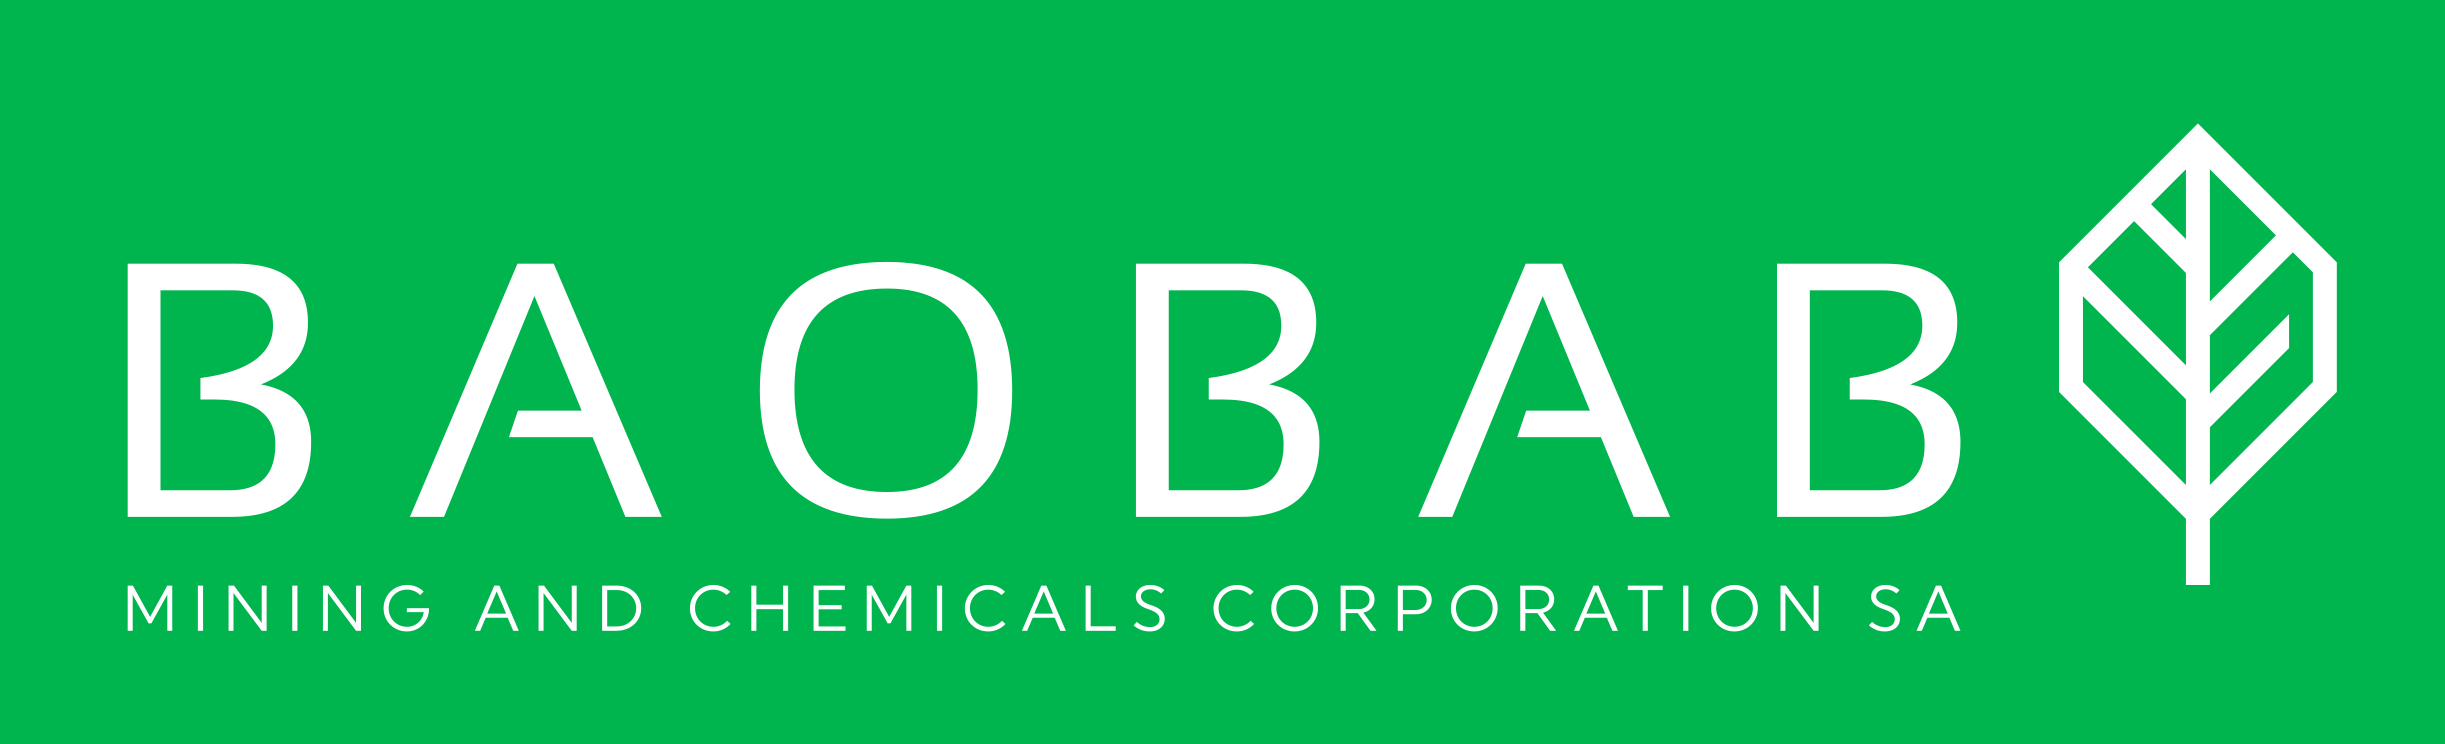 Baobab Tag LOGO_white_green_WEB.png